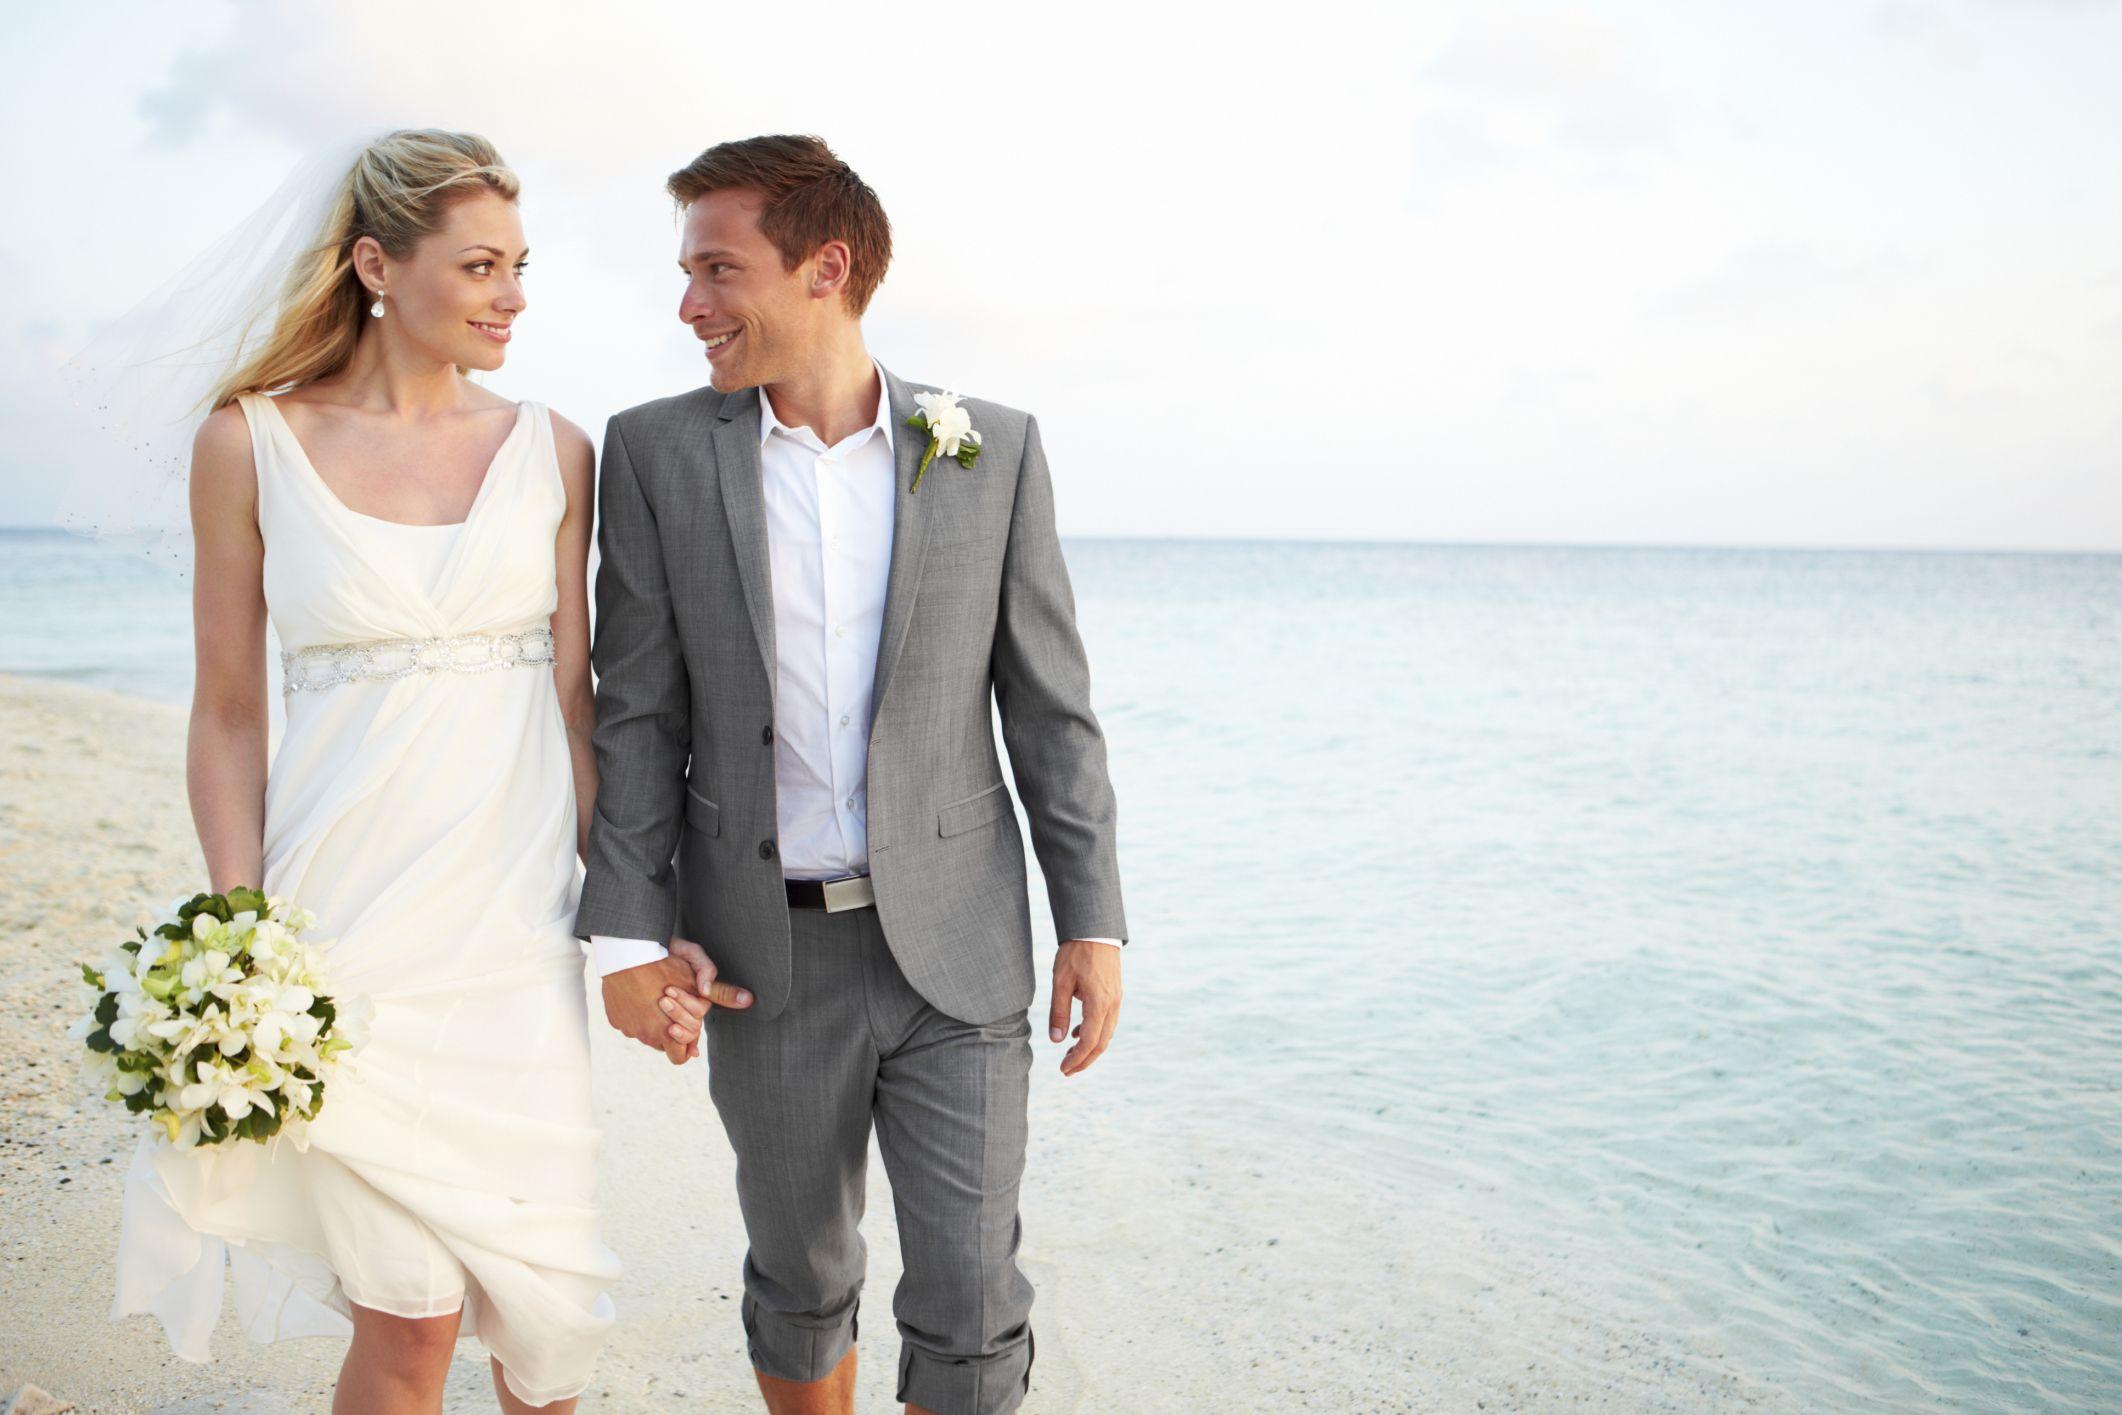 Mens Casual Beach Wedding Attire 2122x1415